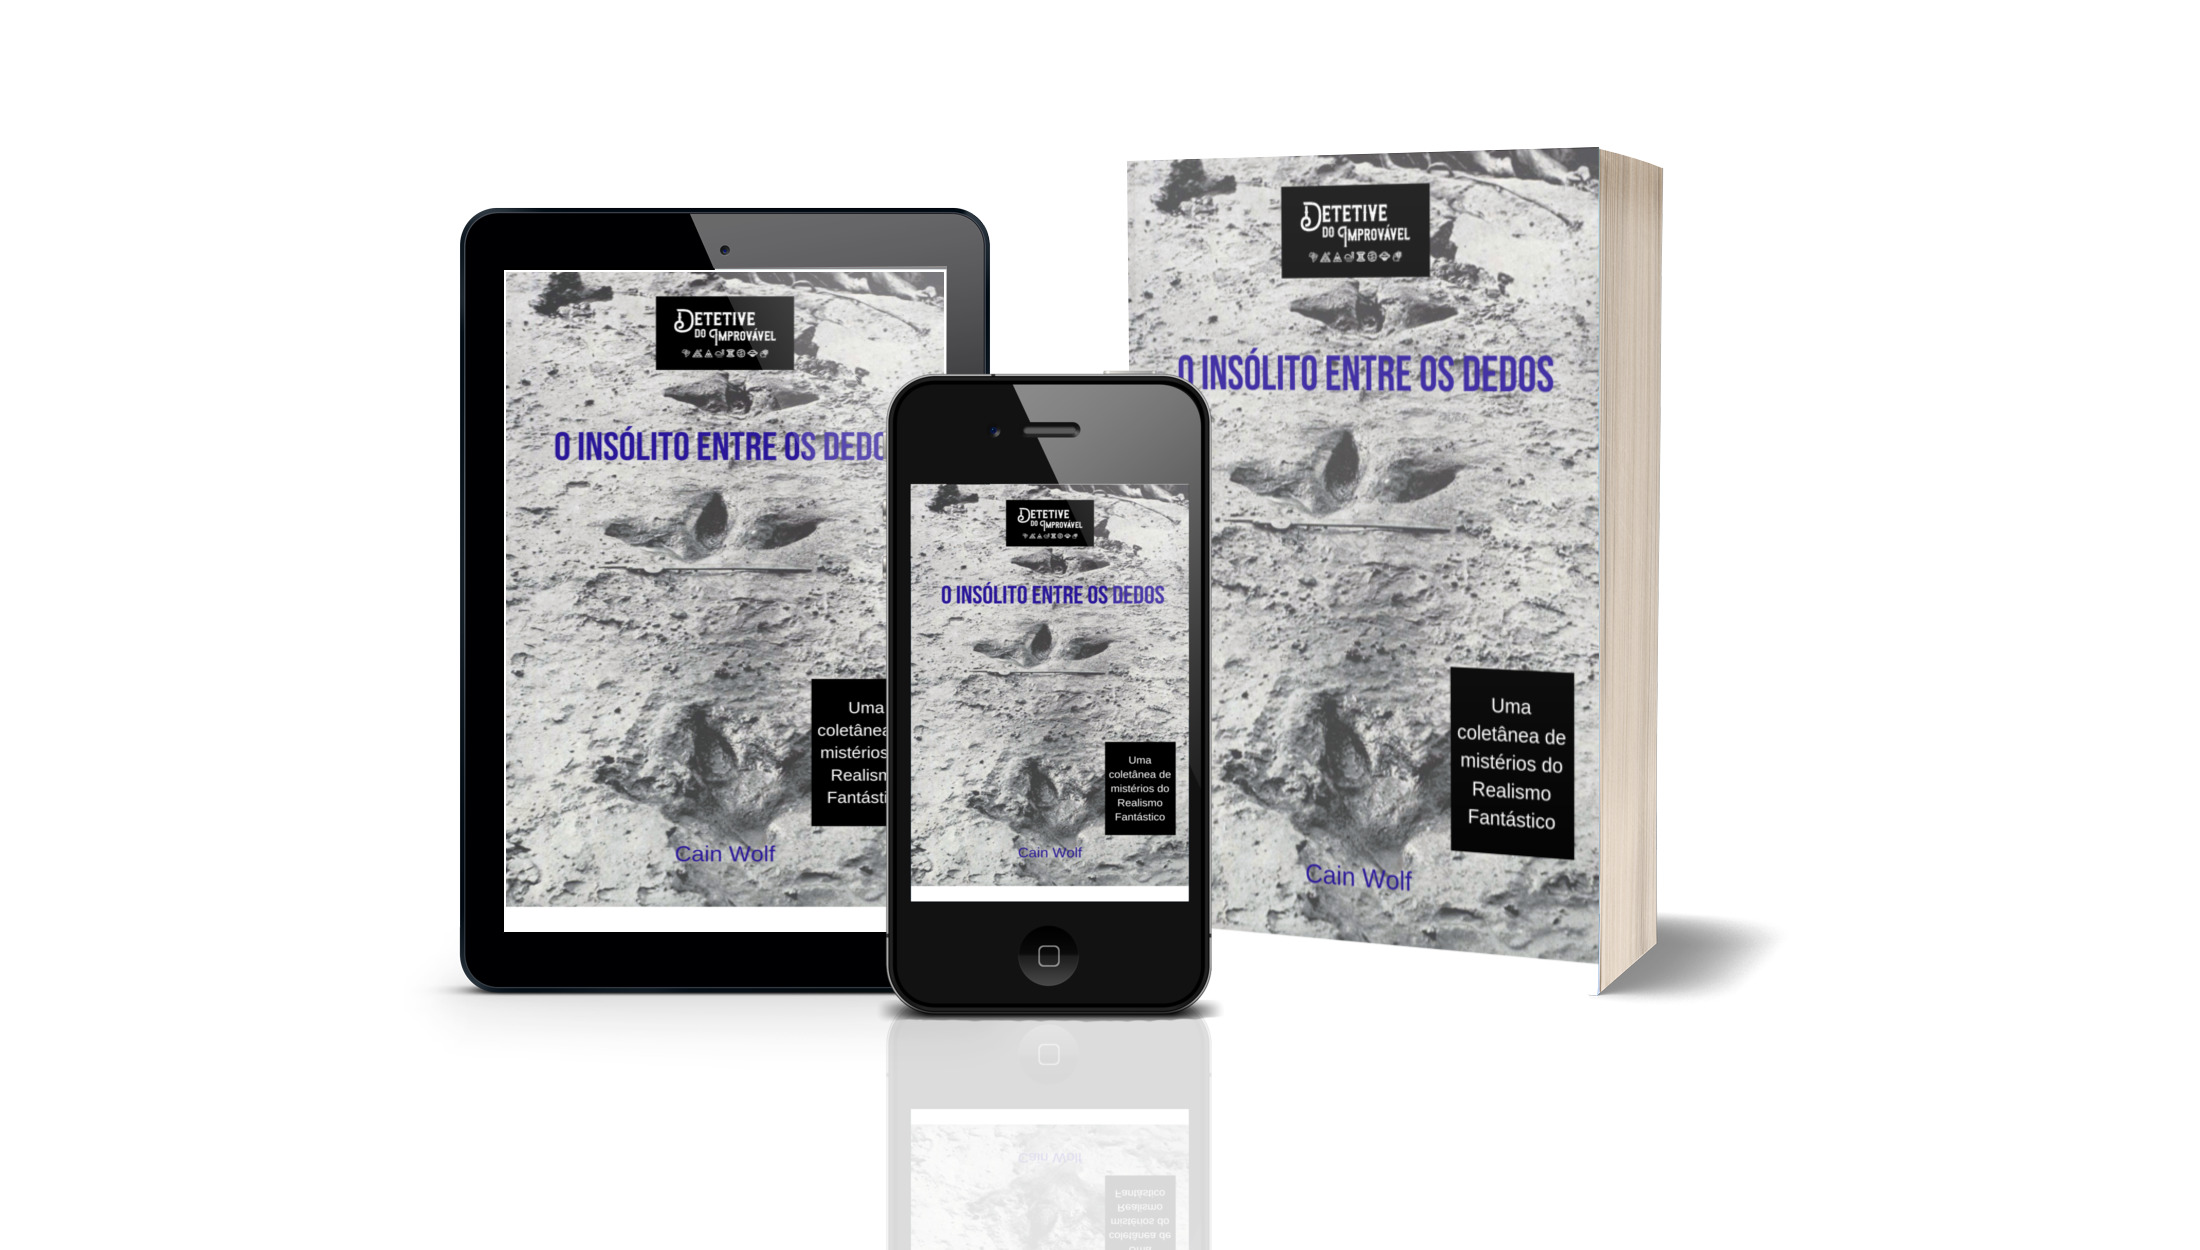 Ebook Gratuito – O Insólito entre os dedos